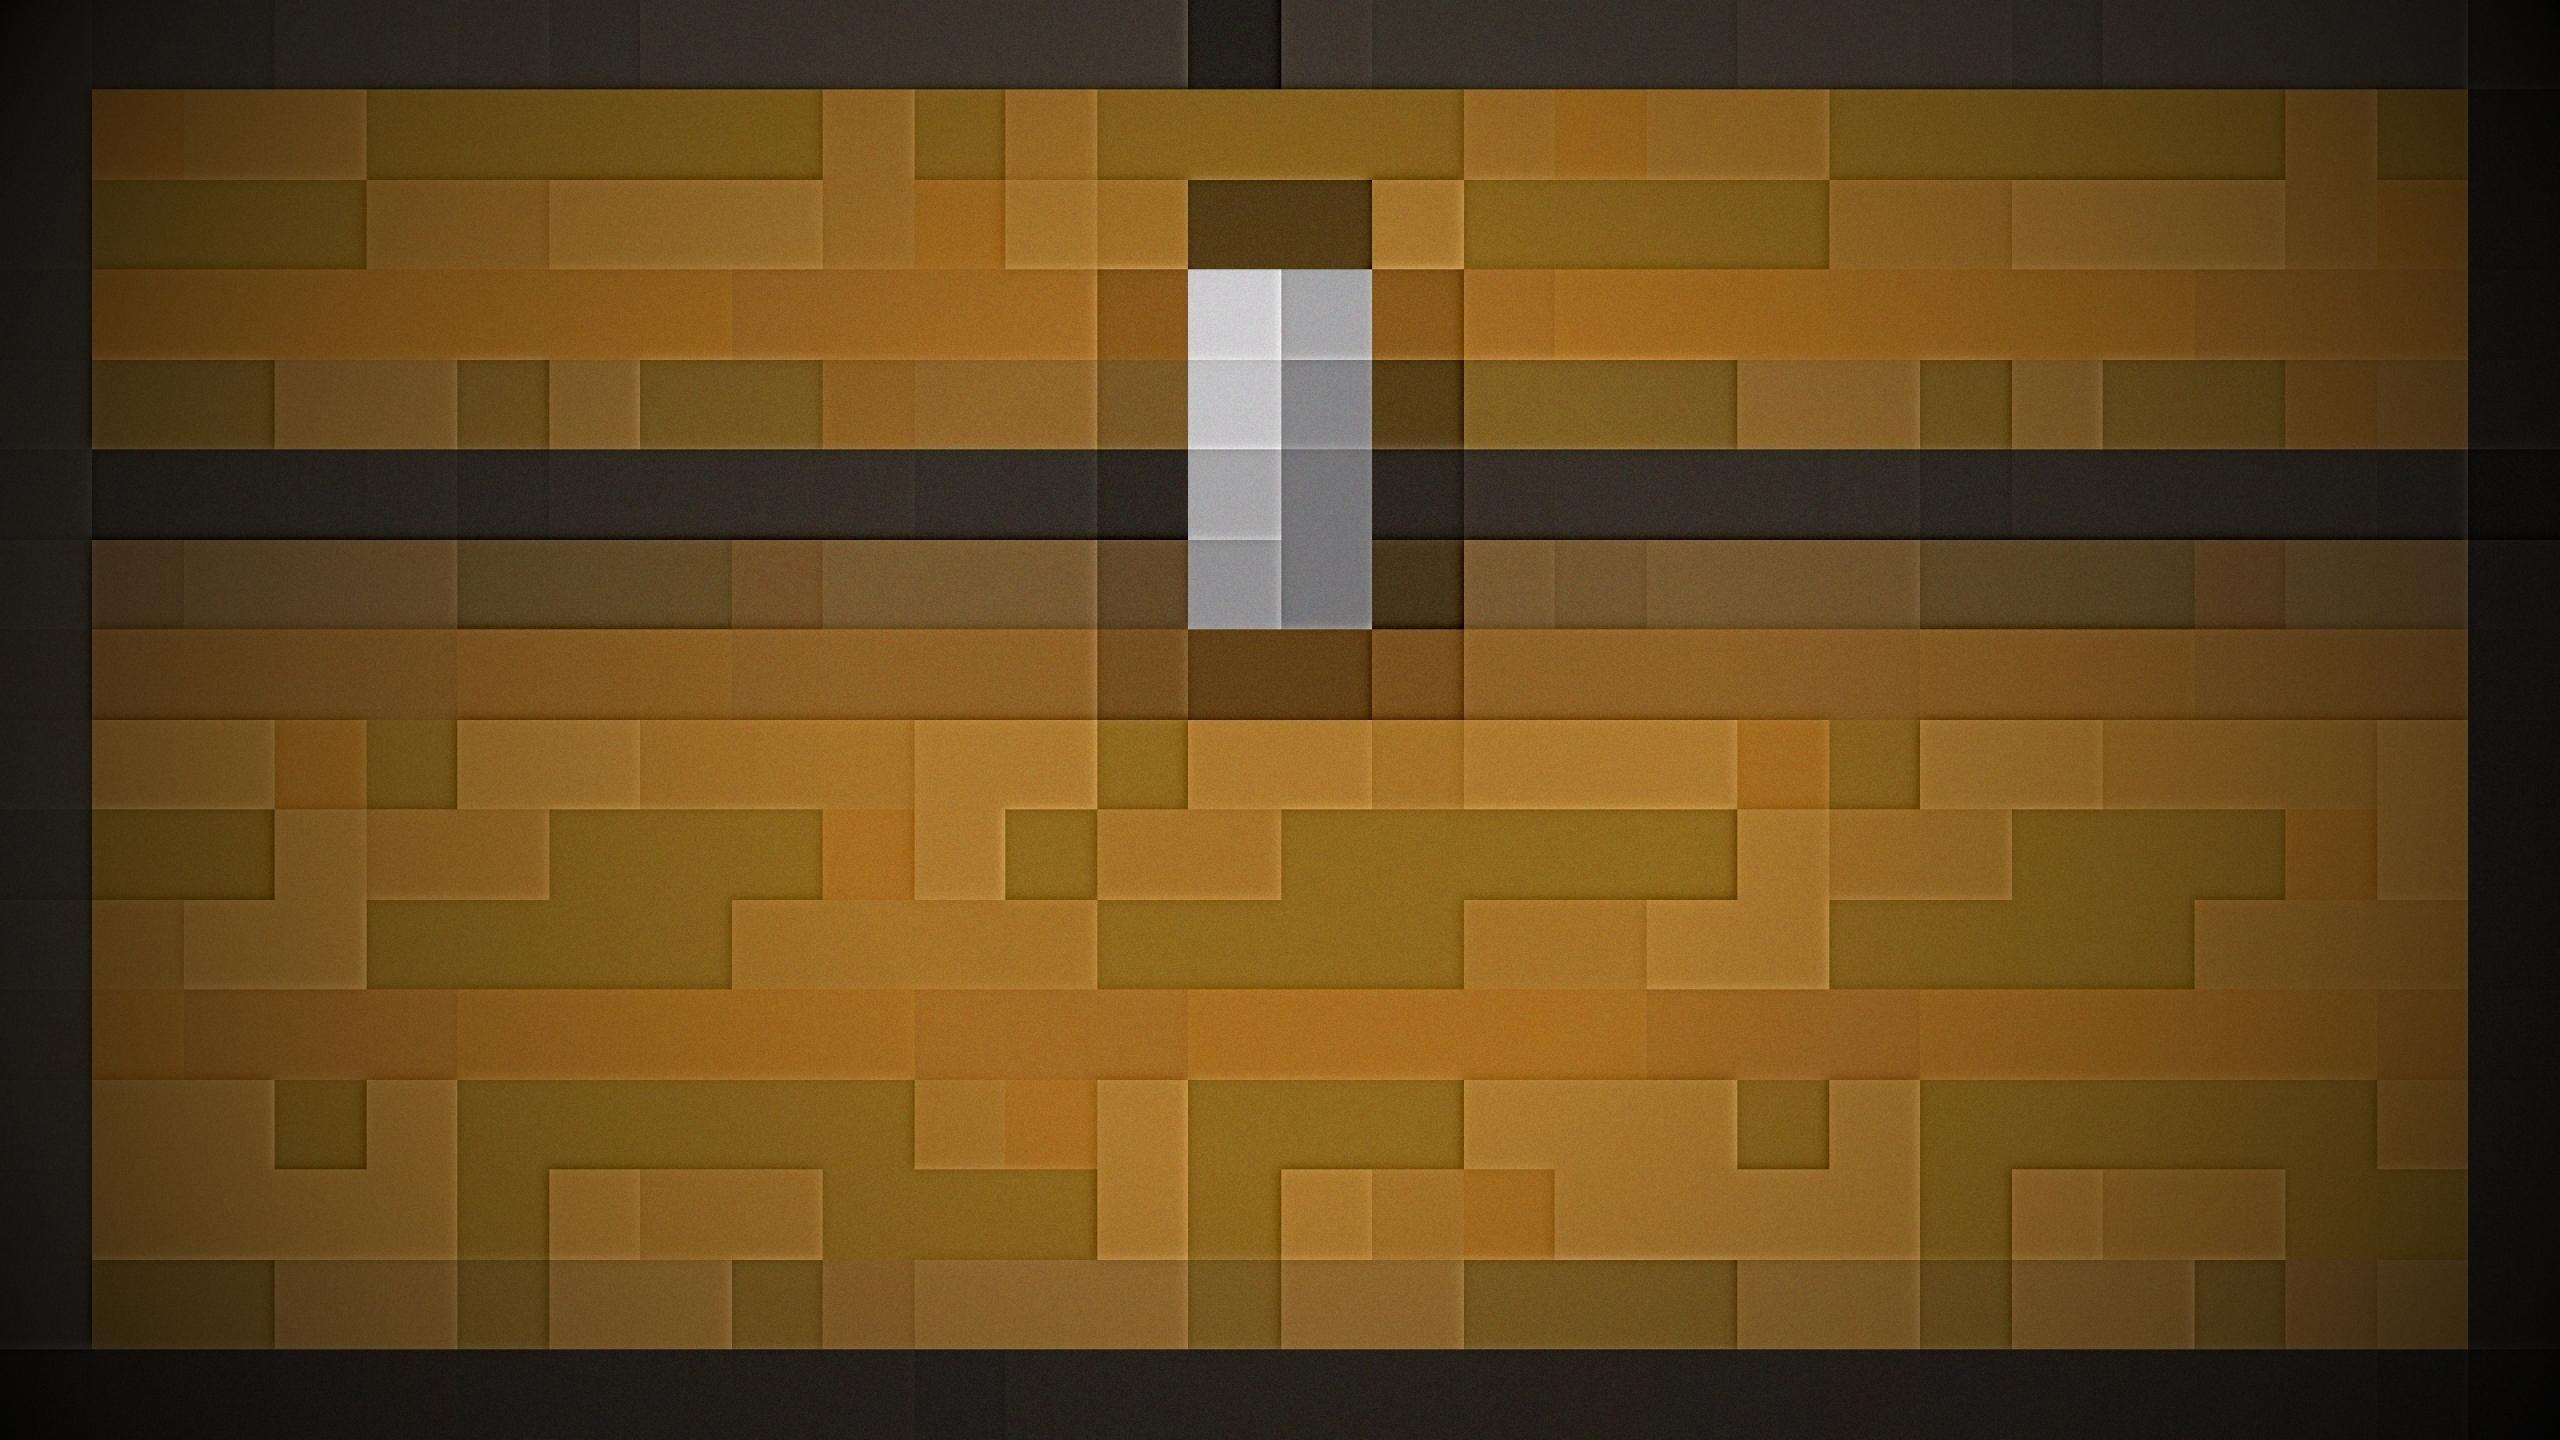 minecraft chest sprites 1920x1080 wallpaper Miscellaneous HD Wallpaper 2560x1440